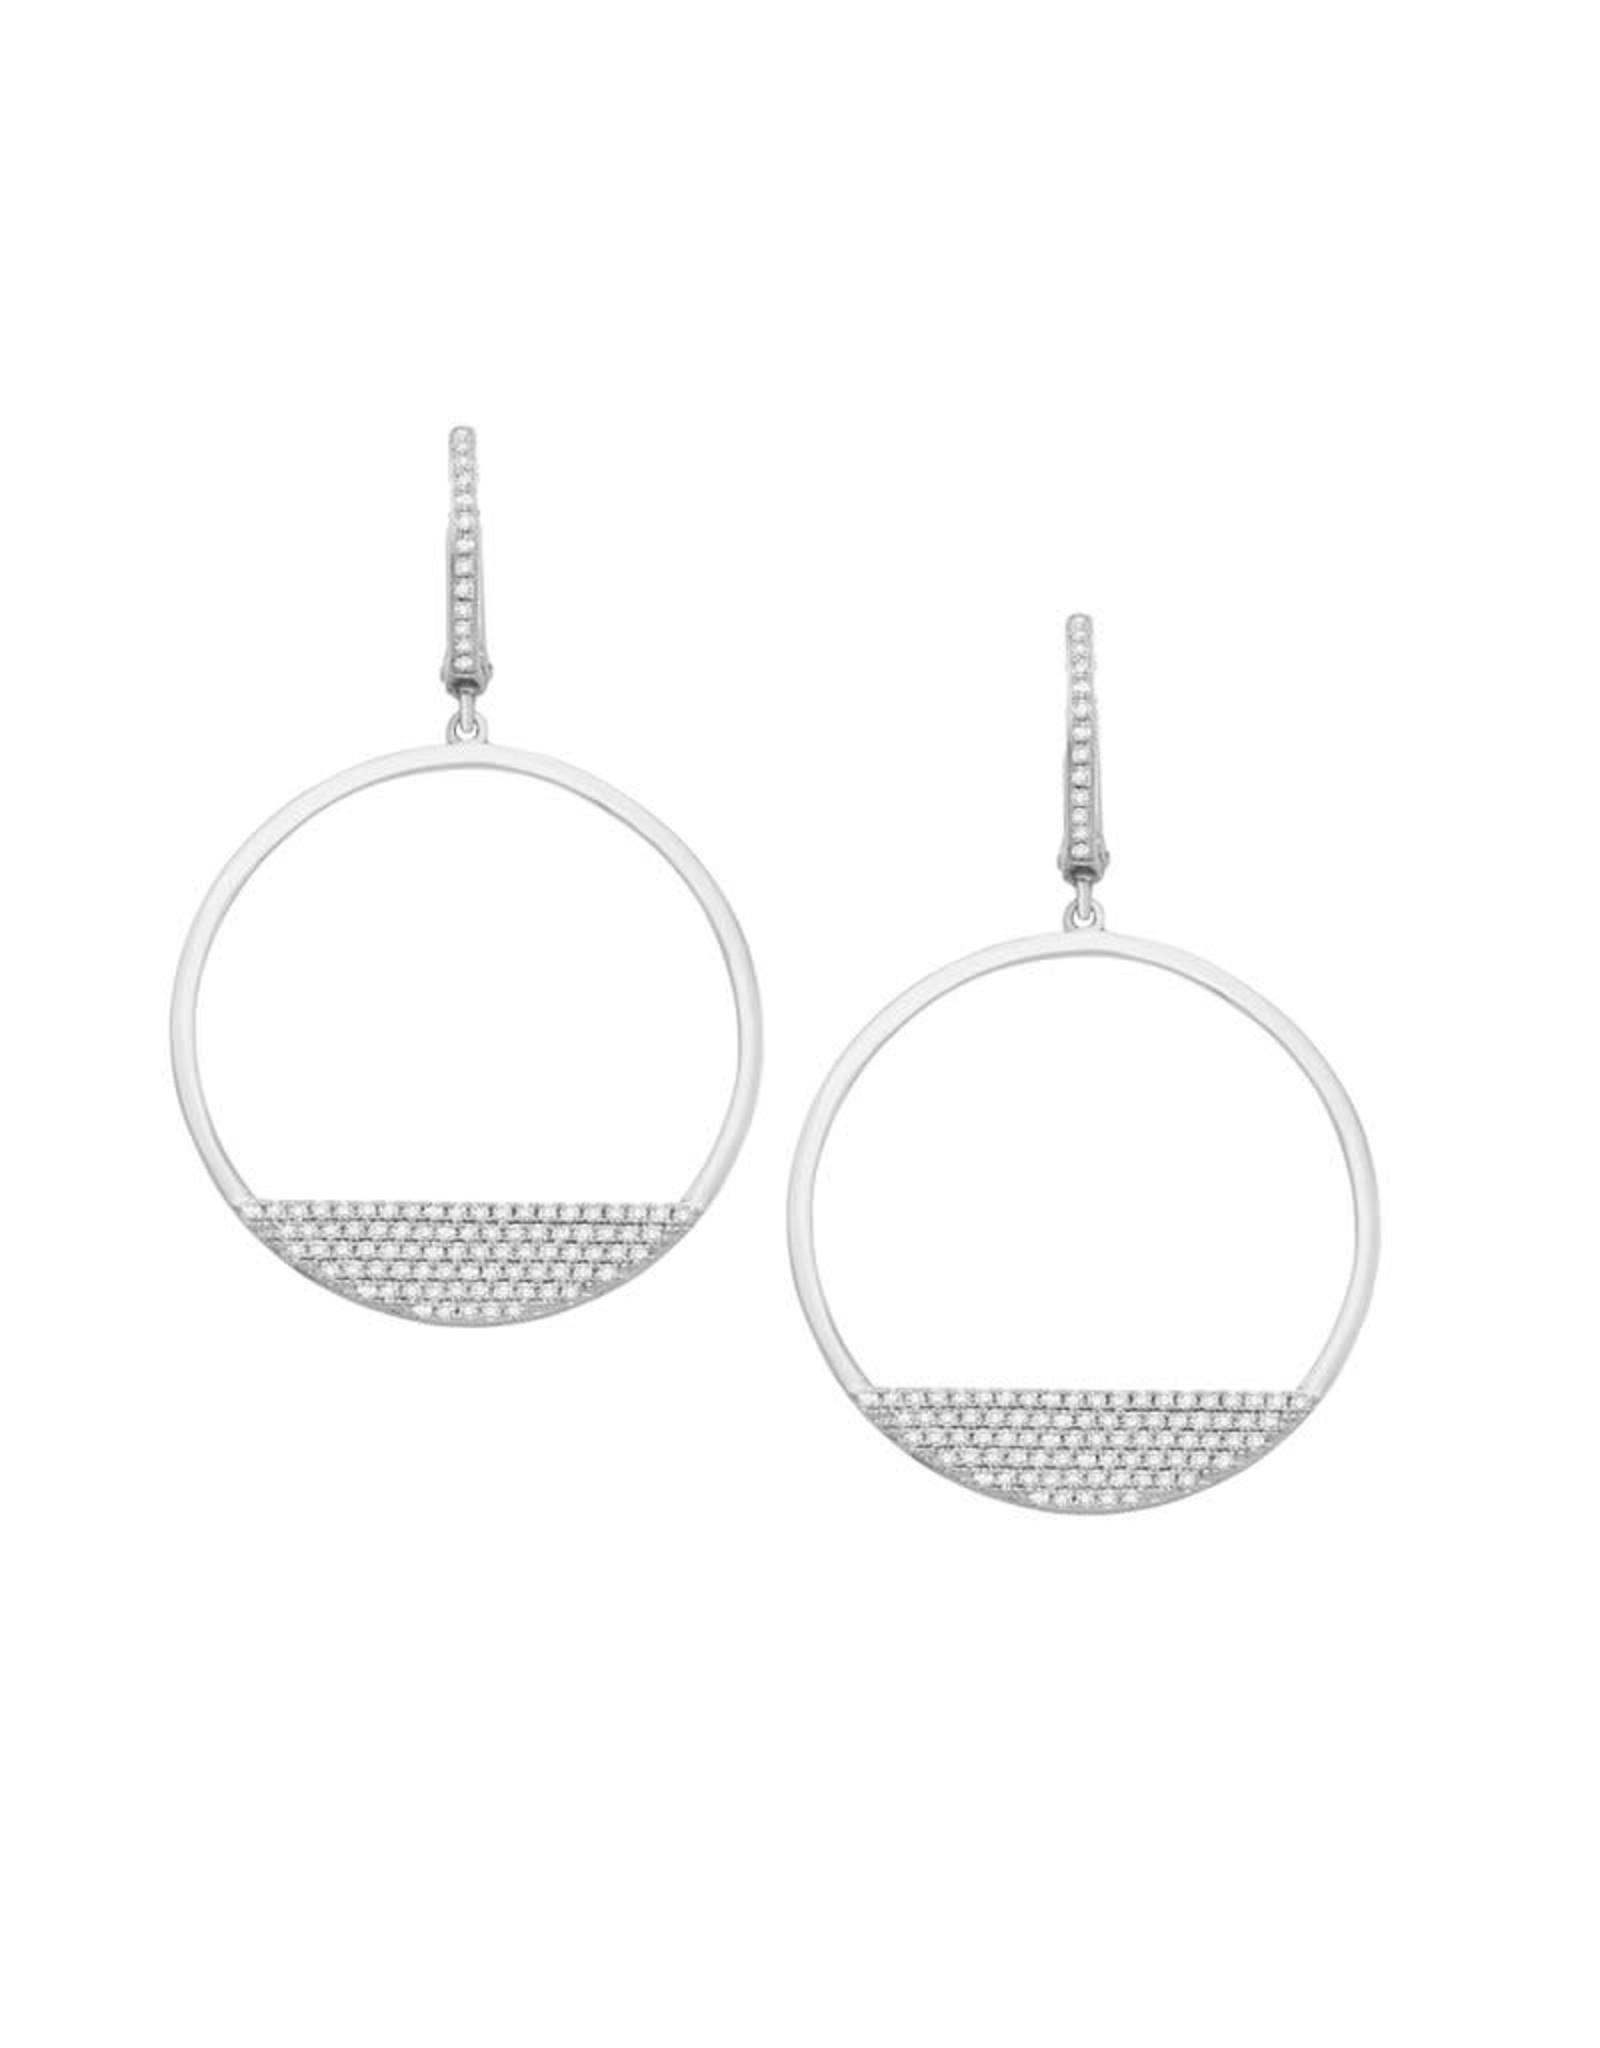 14K White Gold Half Circle Pave Diamond Earrings, D: 0.54ct